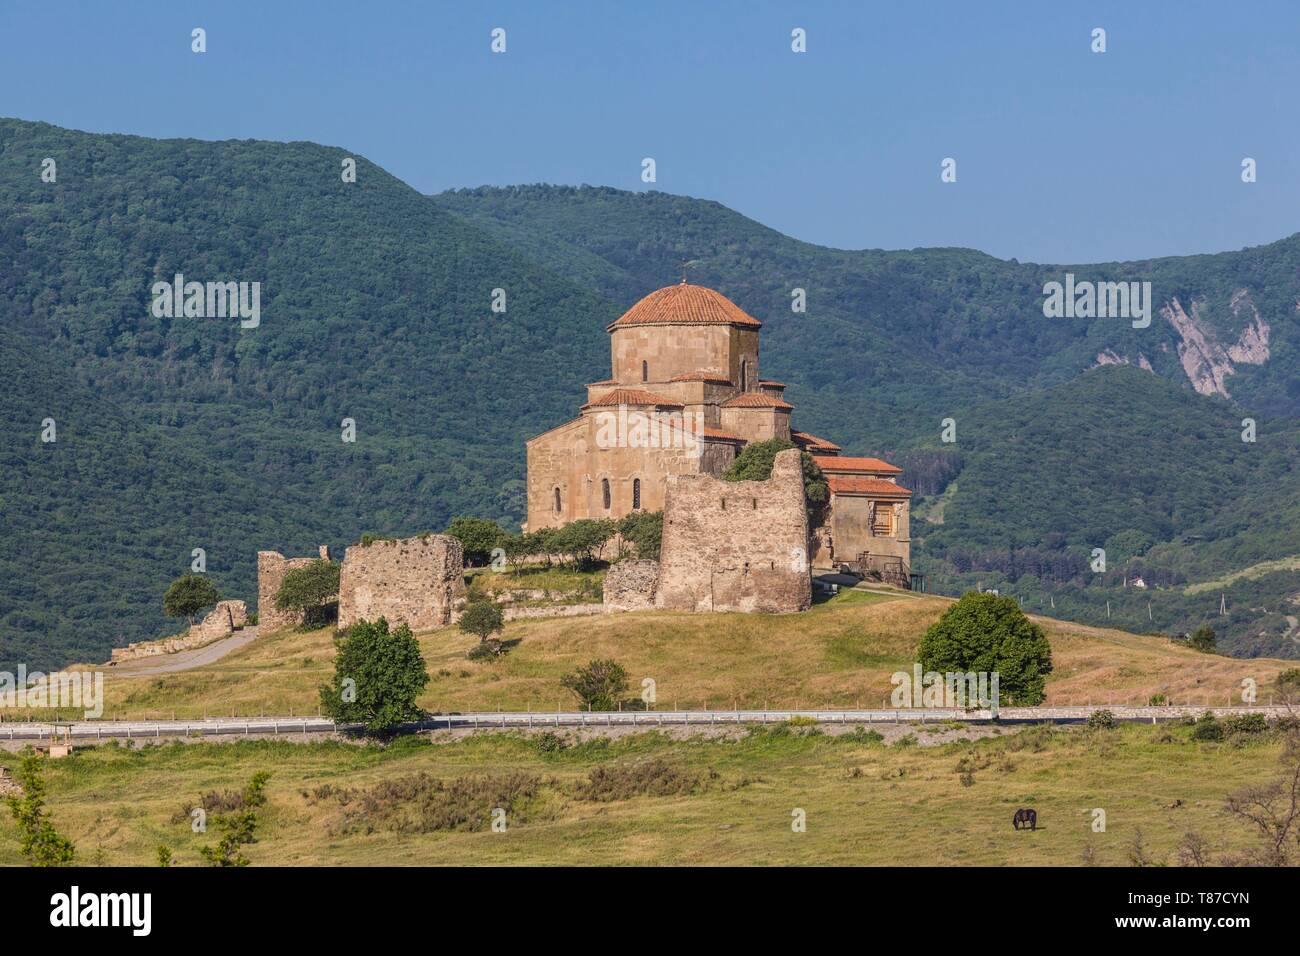 Georgia, Mtskheta, spiritual town where Christianity was established in 327AD, Jvari Church, morning - Stock Image